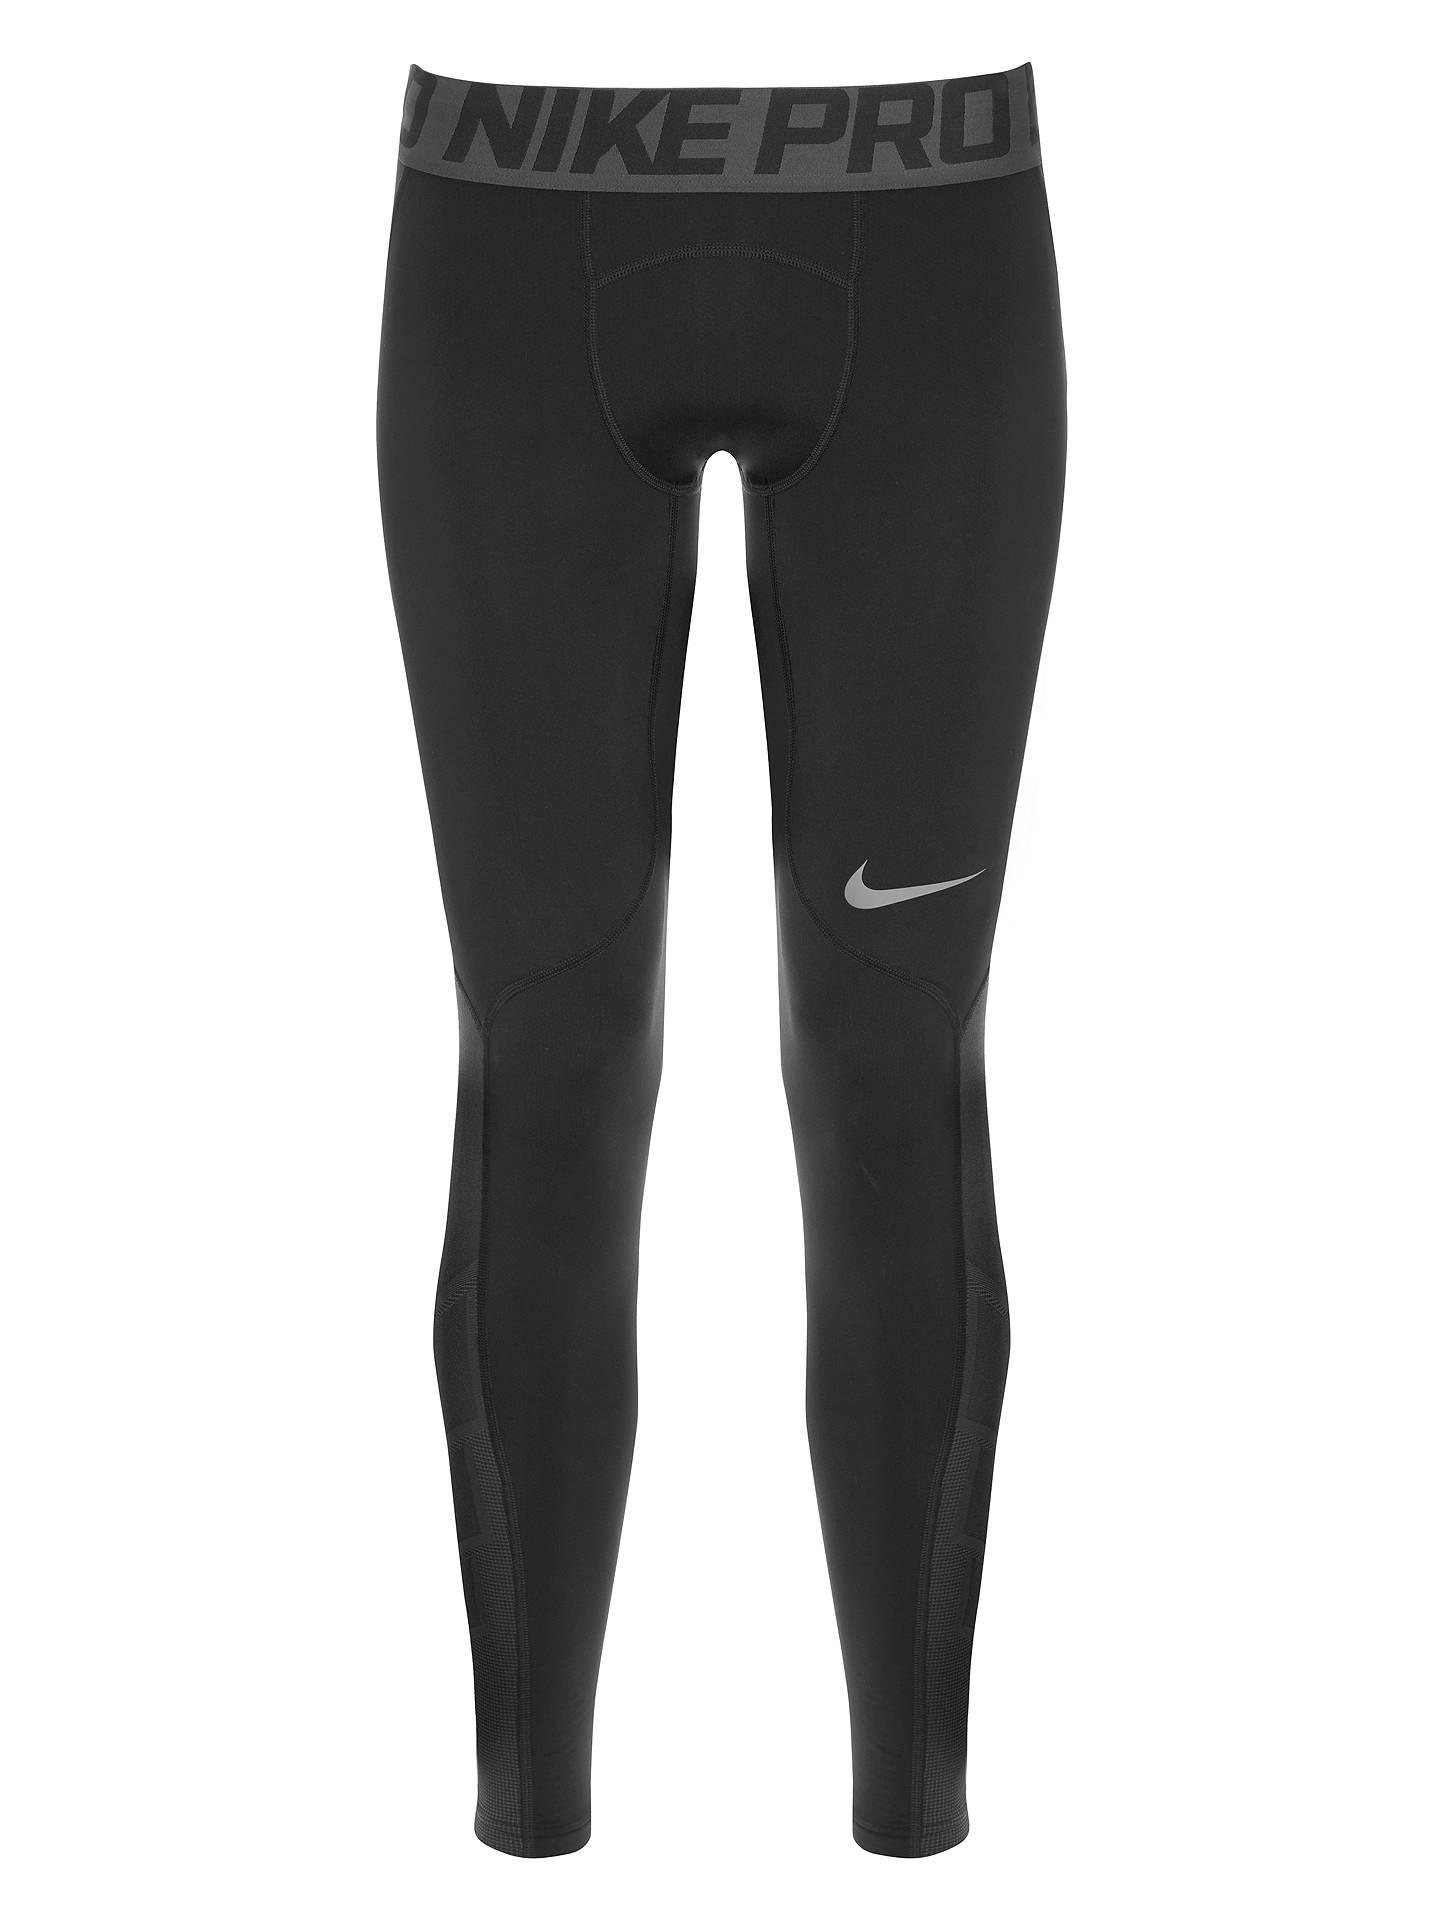 062dbaad29caf7 ... Buy Nike Pro Hyperwarm Training Tights, Black/Cool Grey, S Online at  johnlewis ...